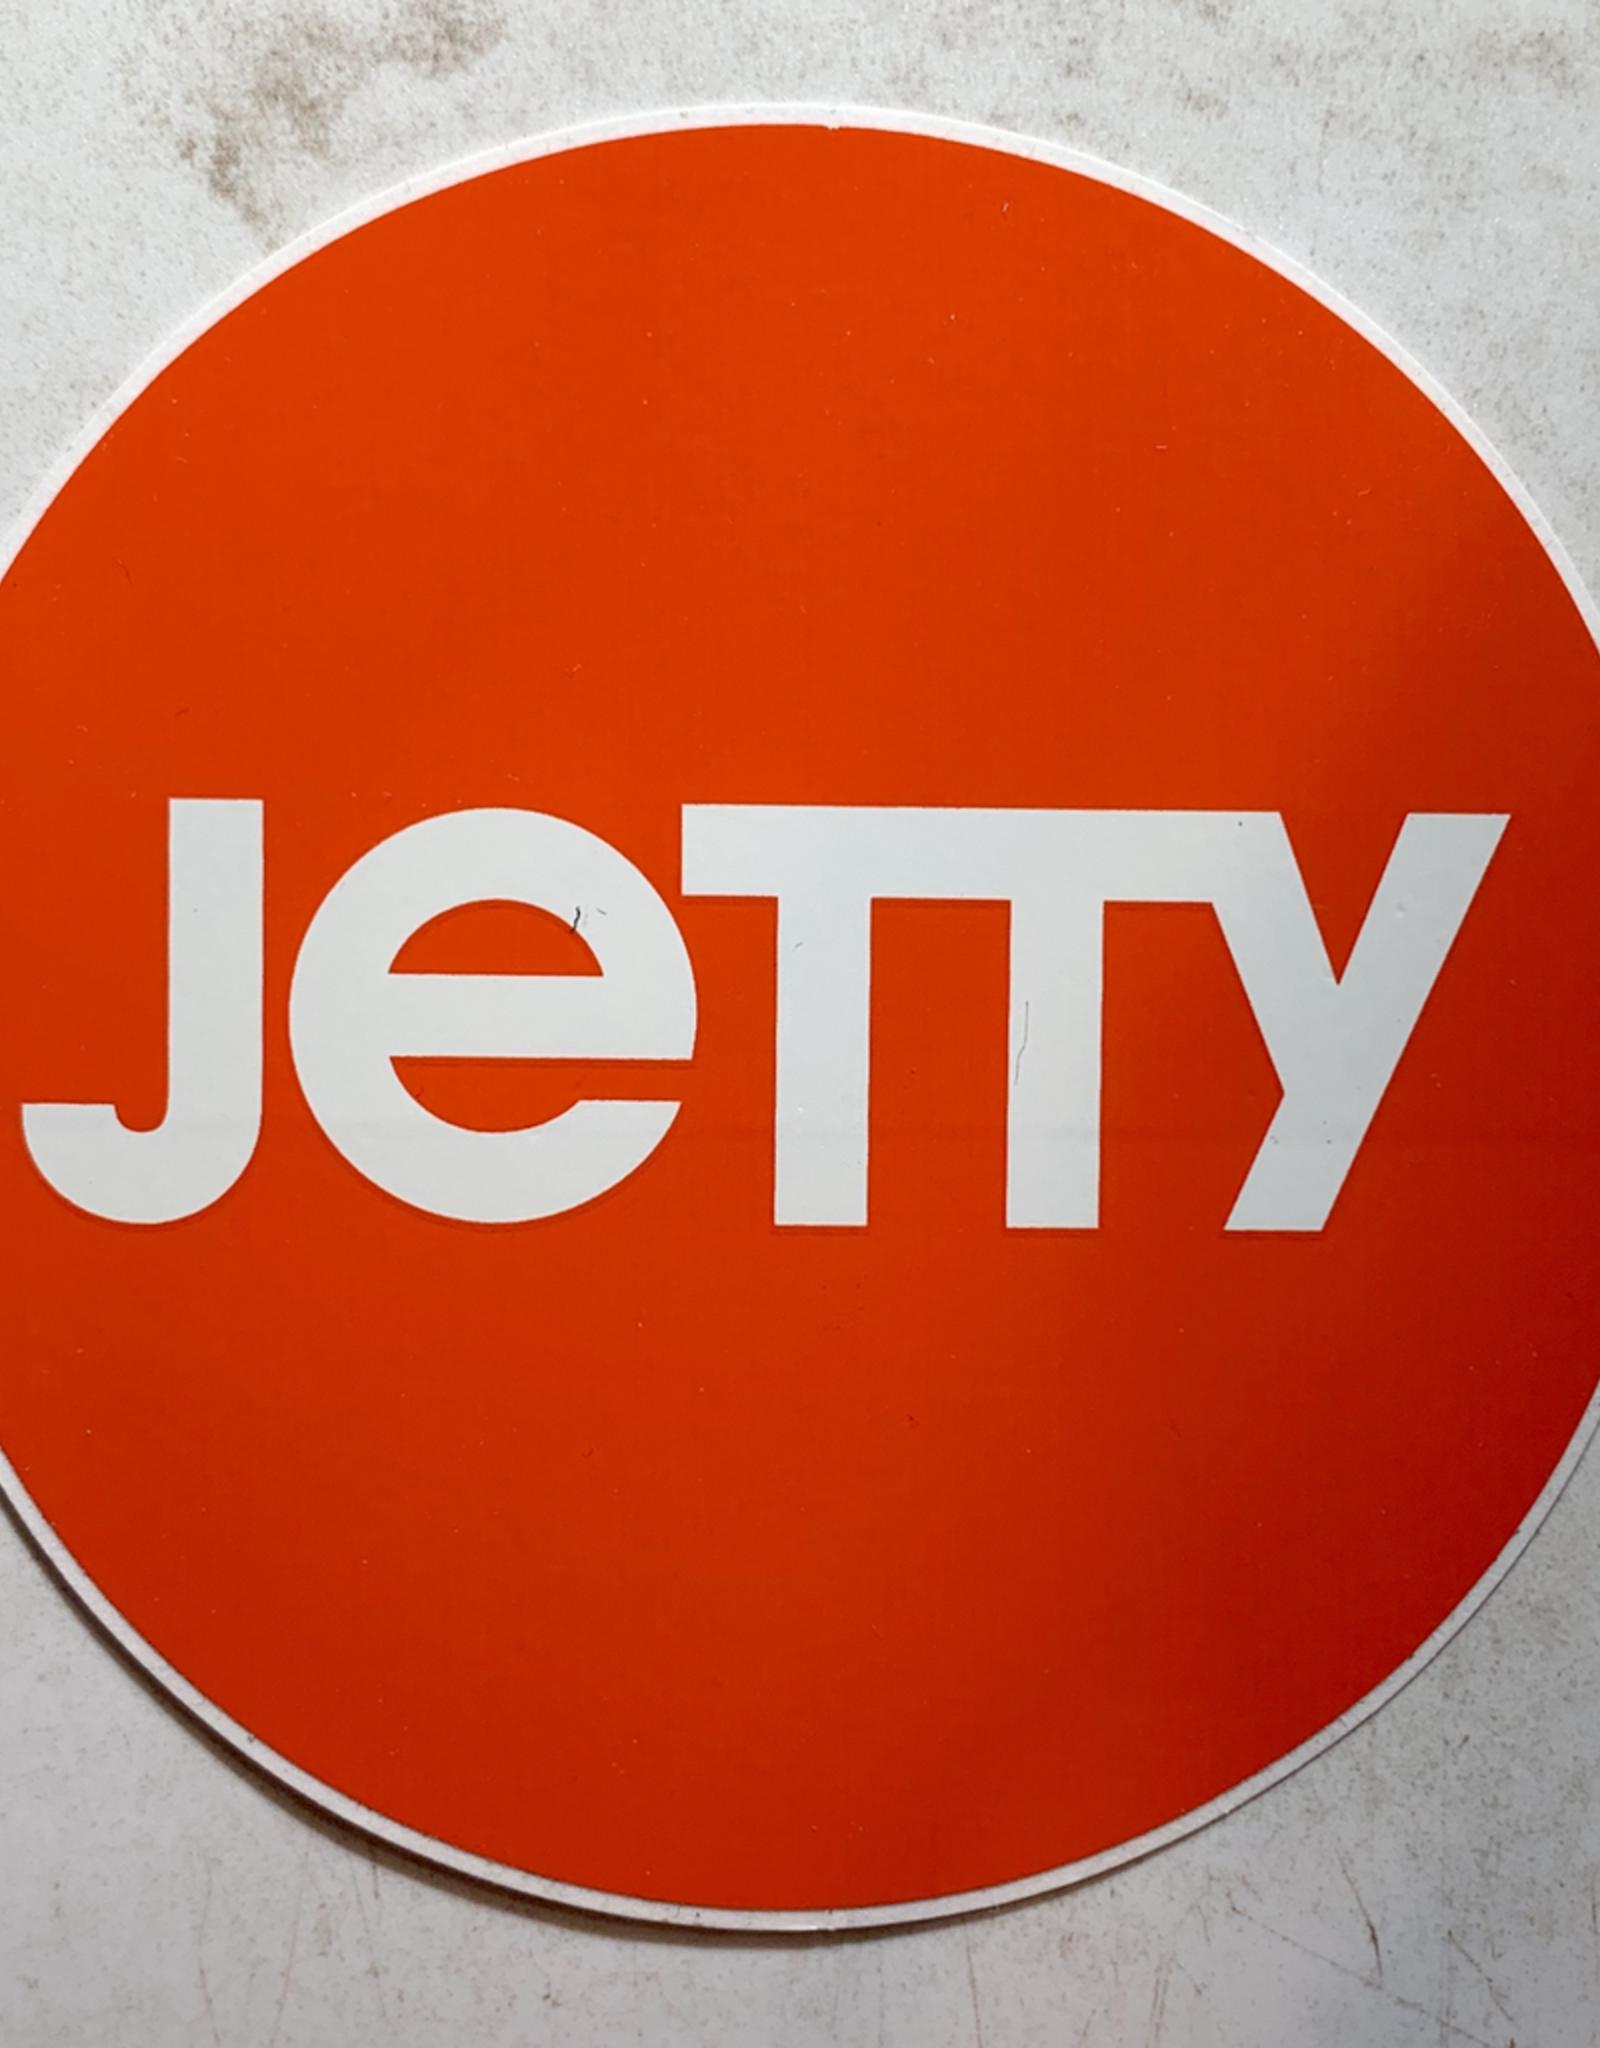 JETTY JETTY CIRCLE STICKER (ORANGE)